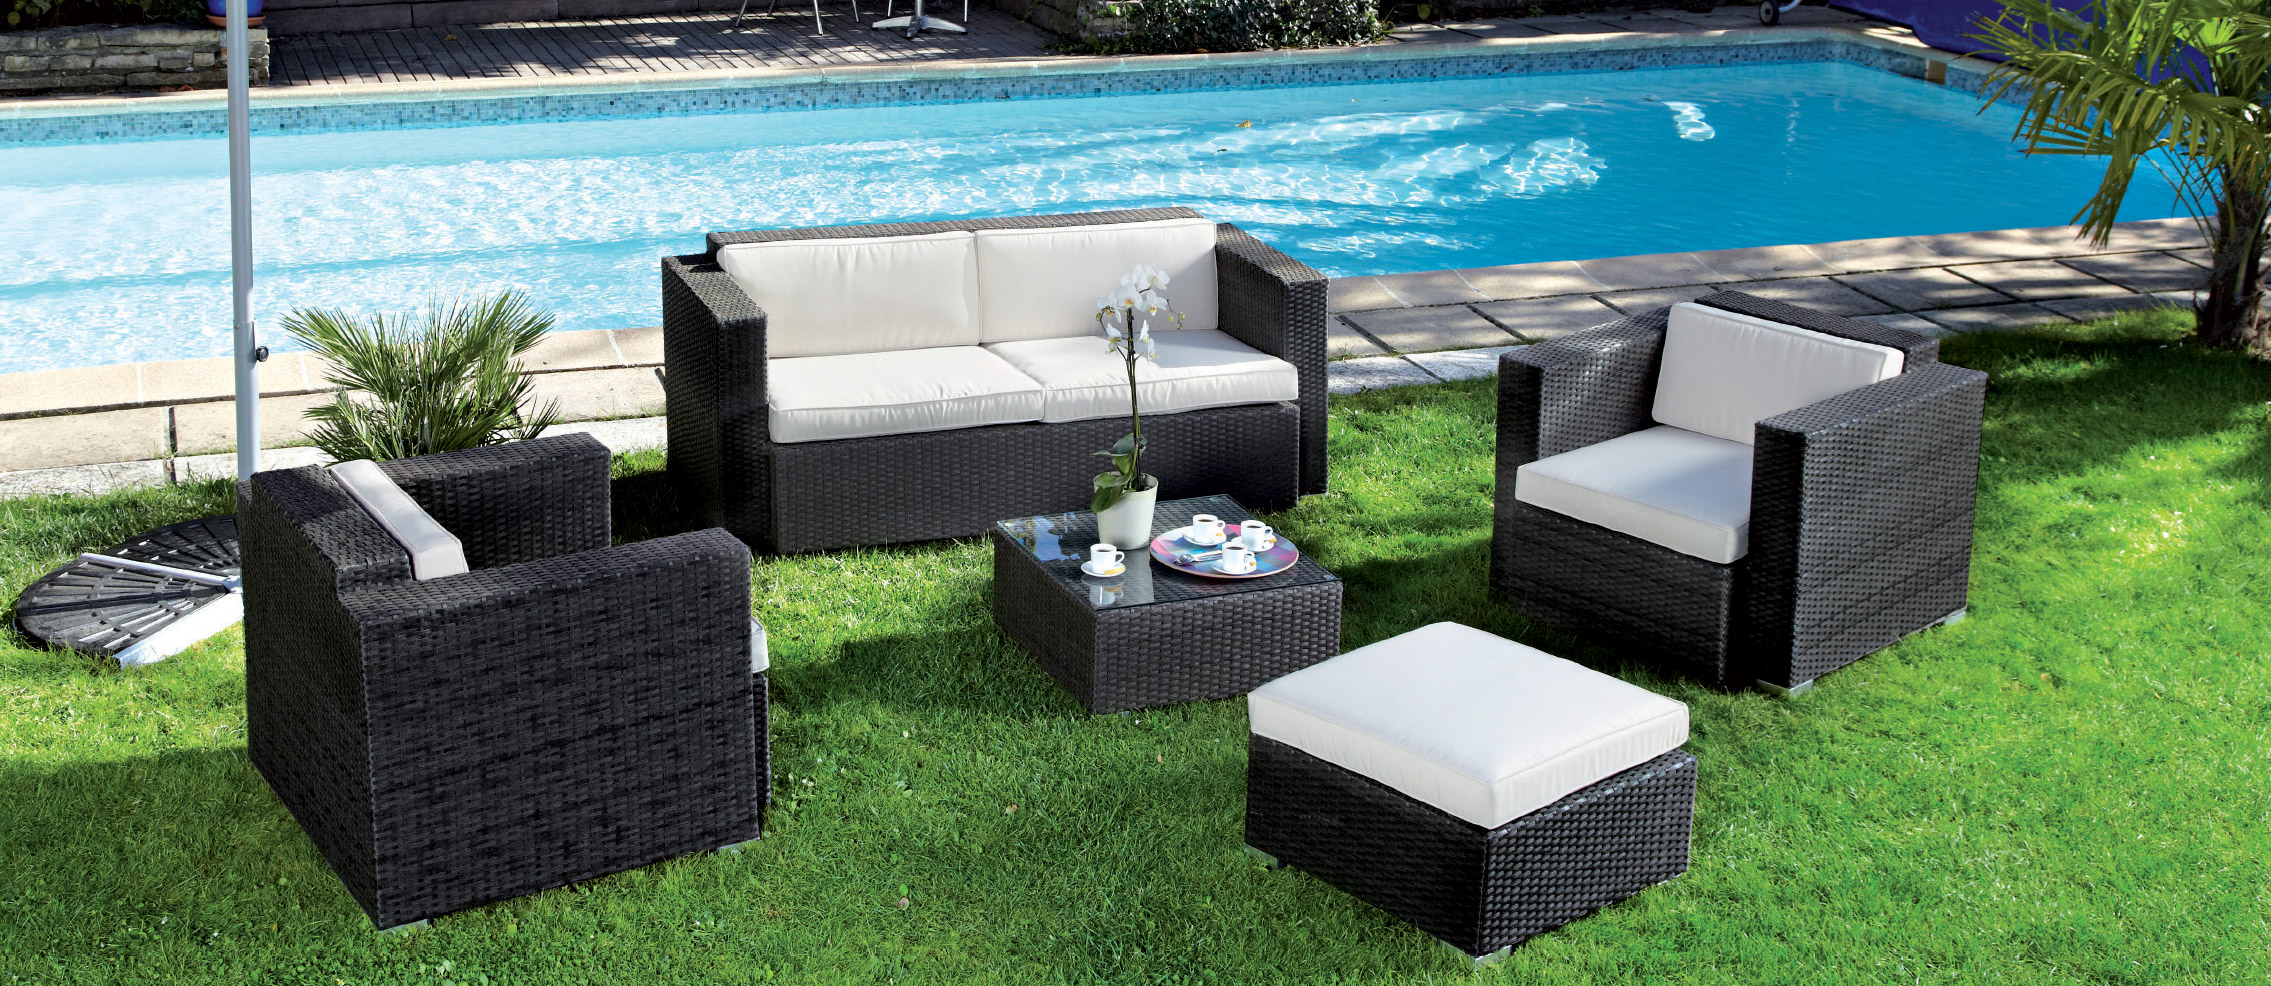 table de jardin plastique carrefour 1 de jardin bri arche salon de jardin pas cher mobilier de jardin 2271x986